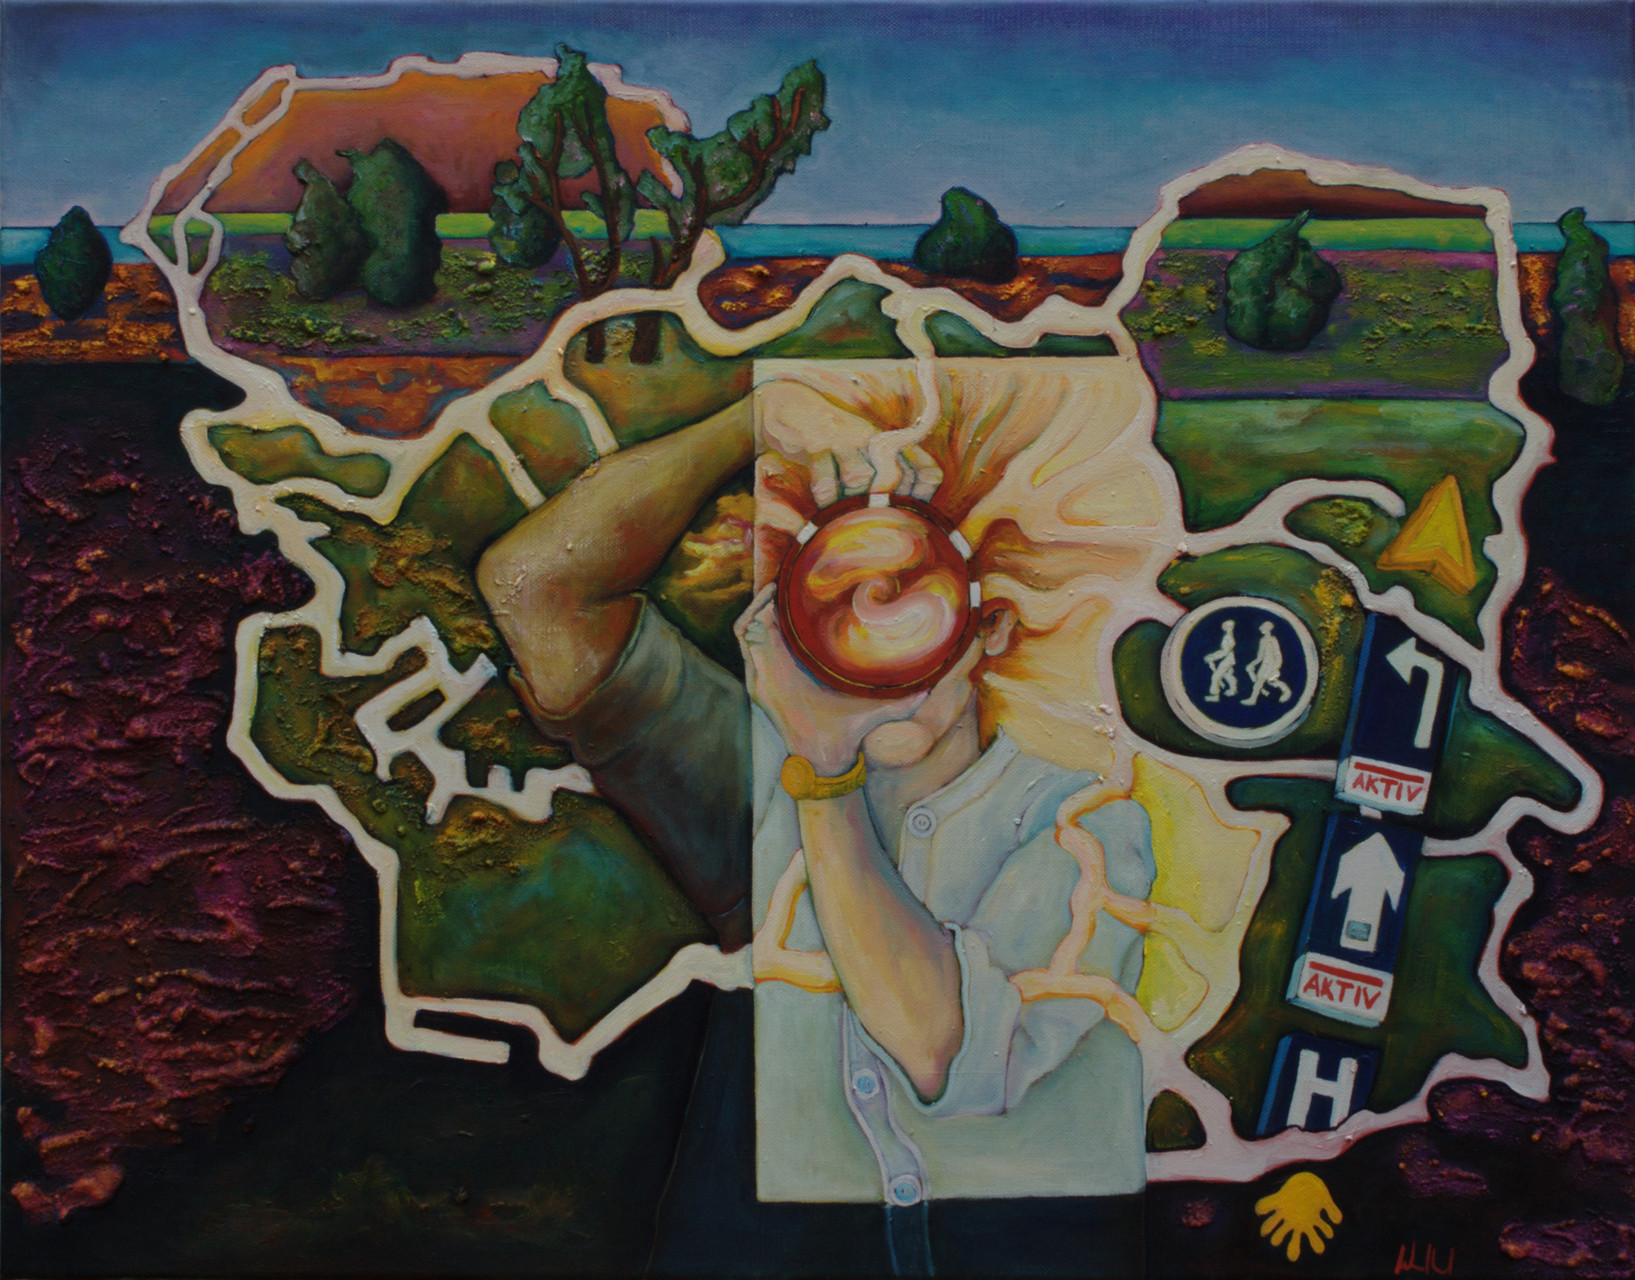 Heidewanderung · 2015 · Acryl, Öl auf Leinwand · 66 x 85 cm